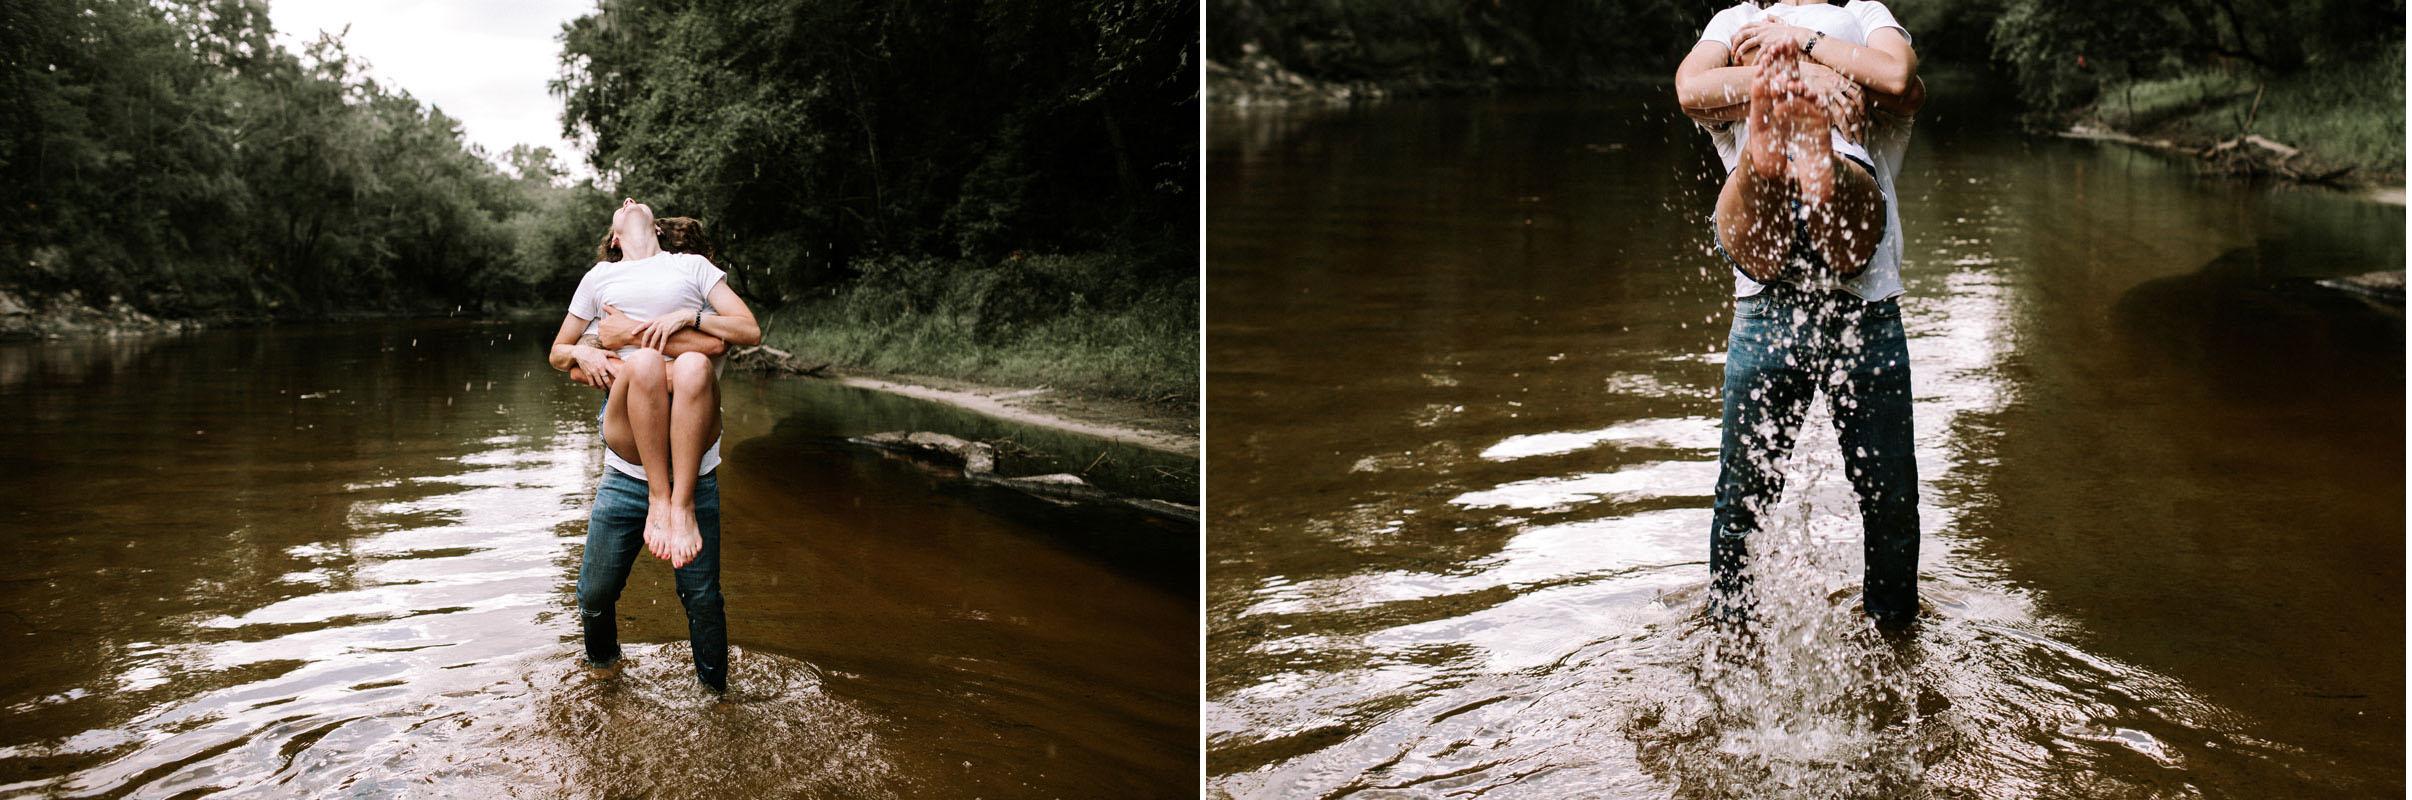 Intimate-couple-river-session-valdosta-wedding-photographers (28).jpg